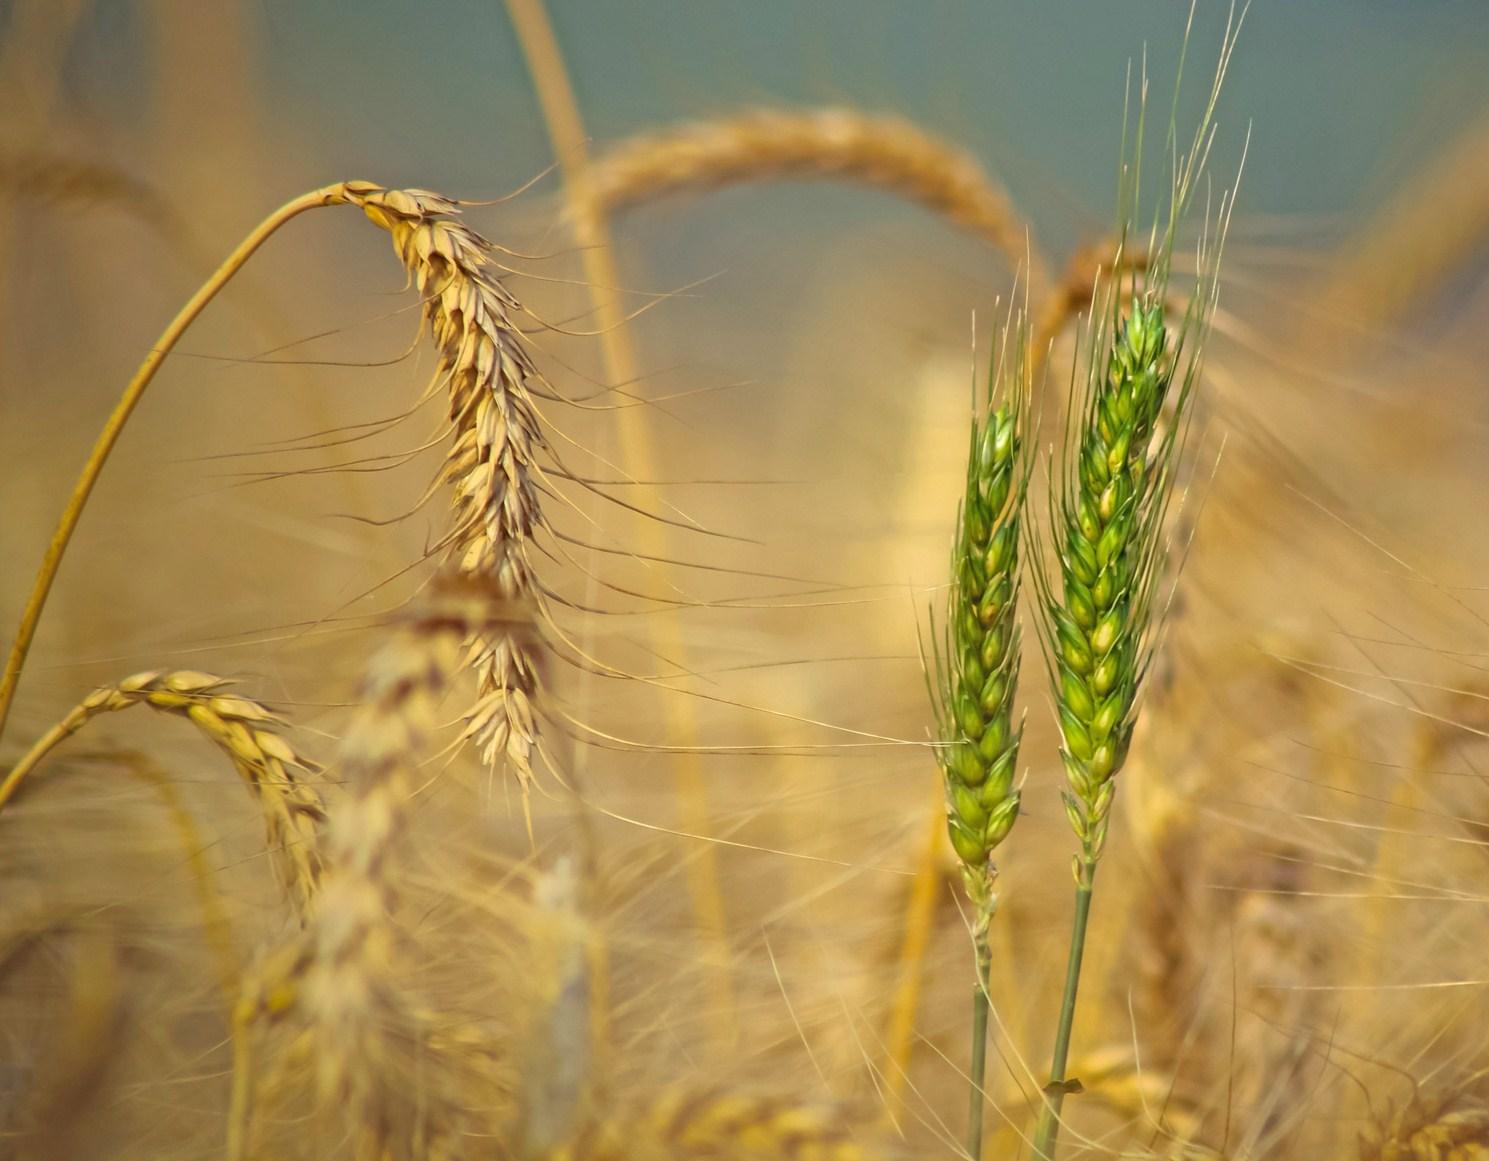 O joio e o trigo